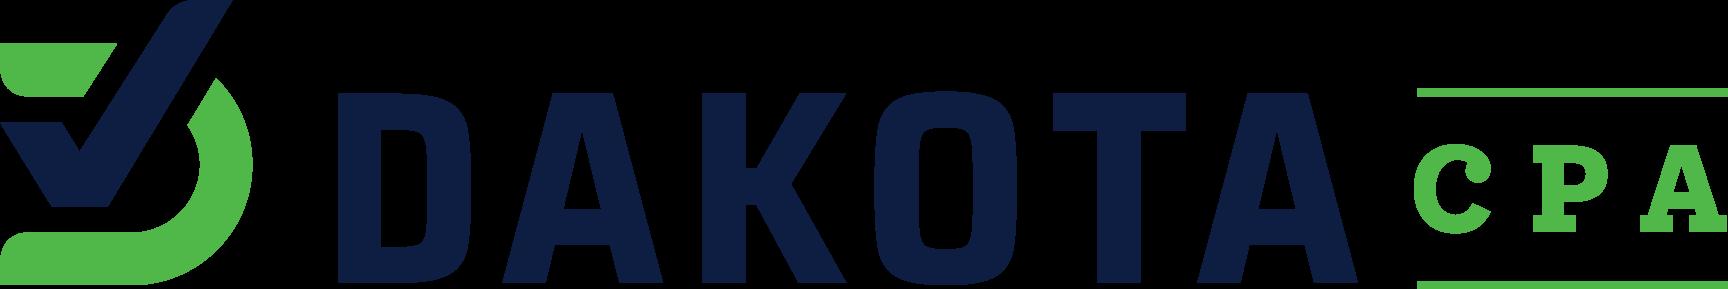 Dakota CPA